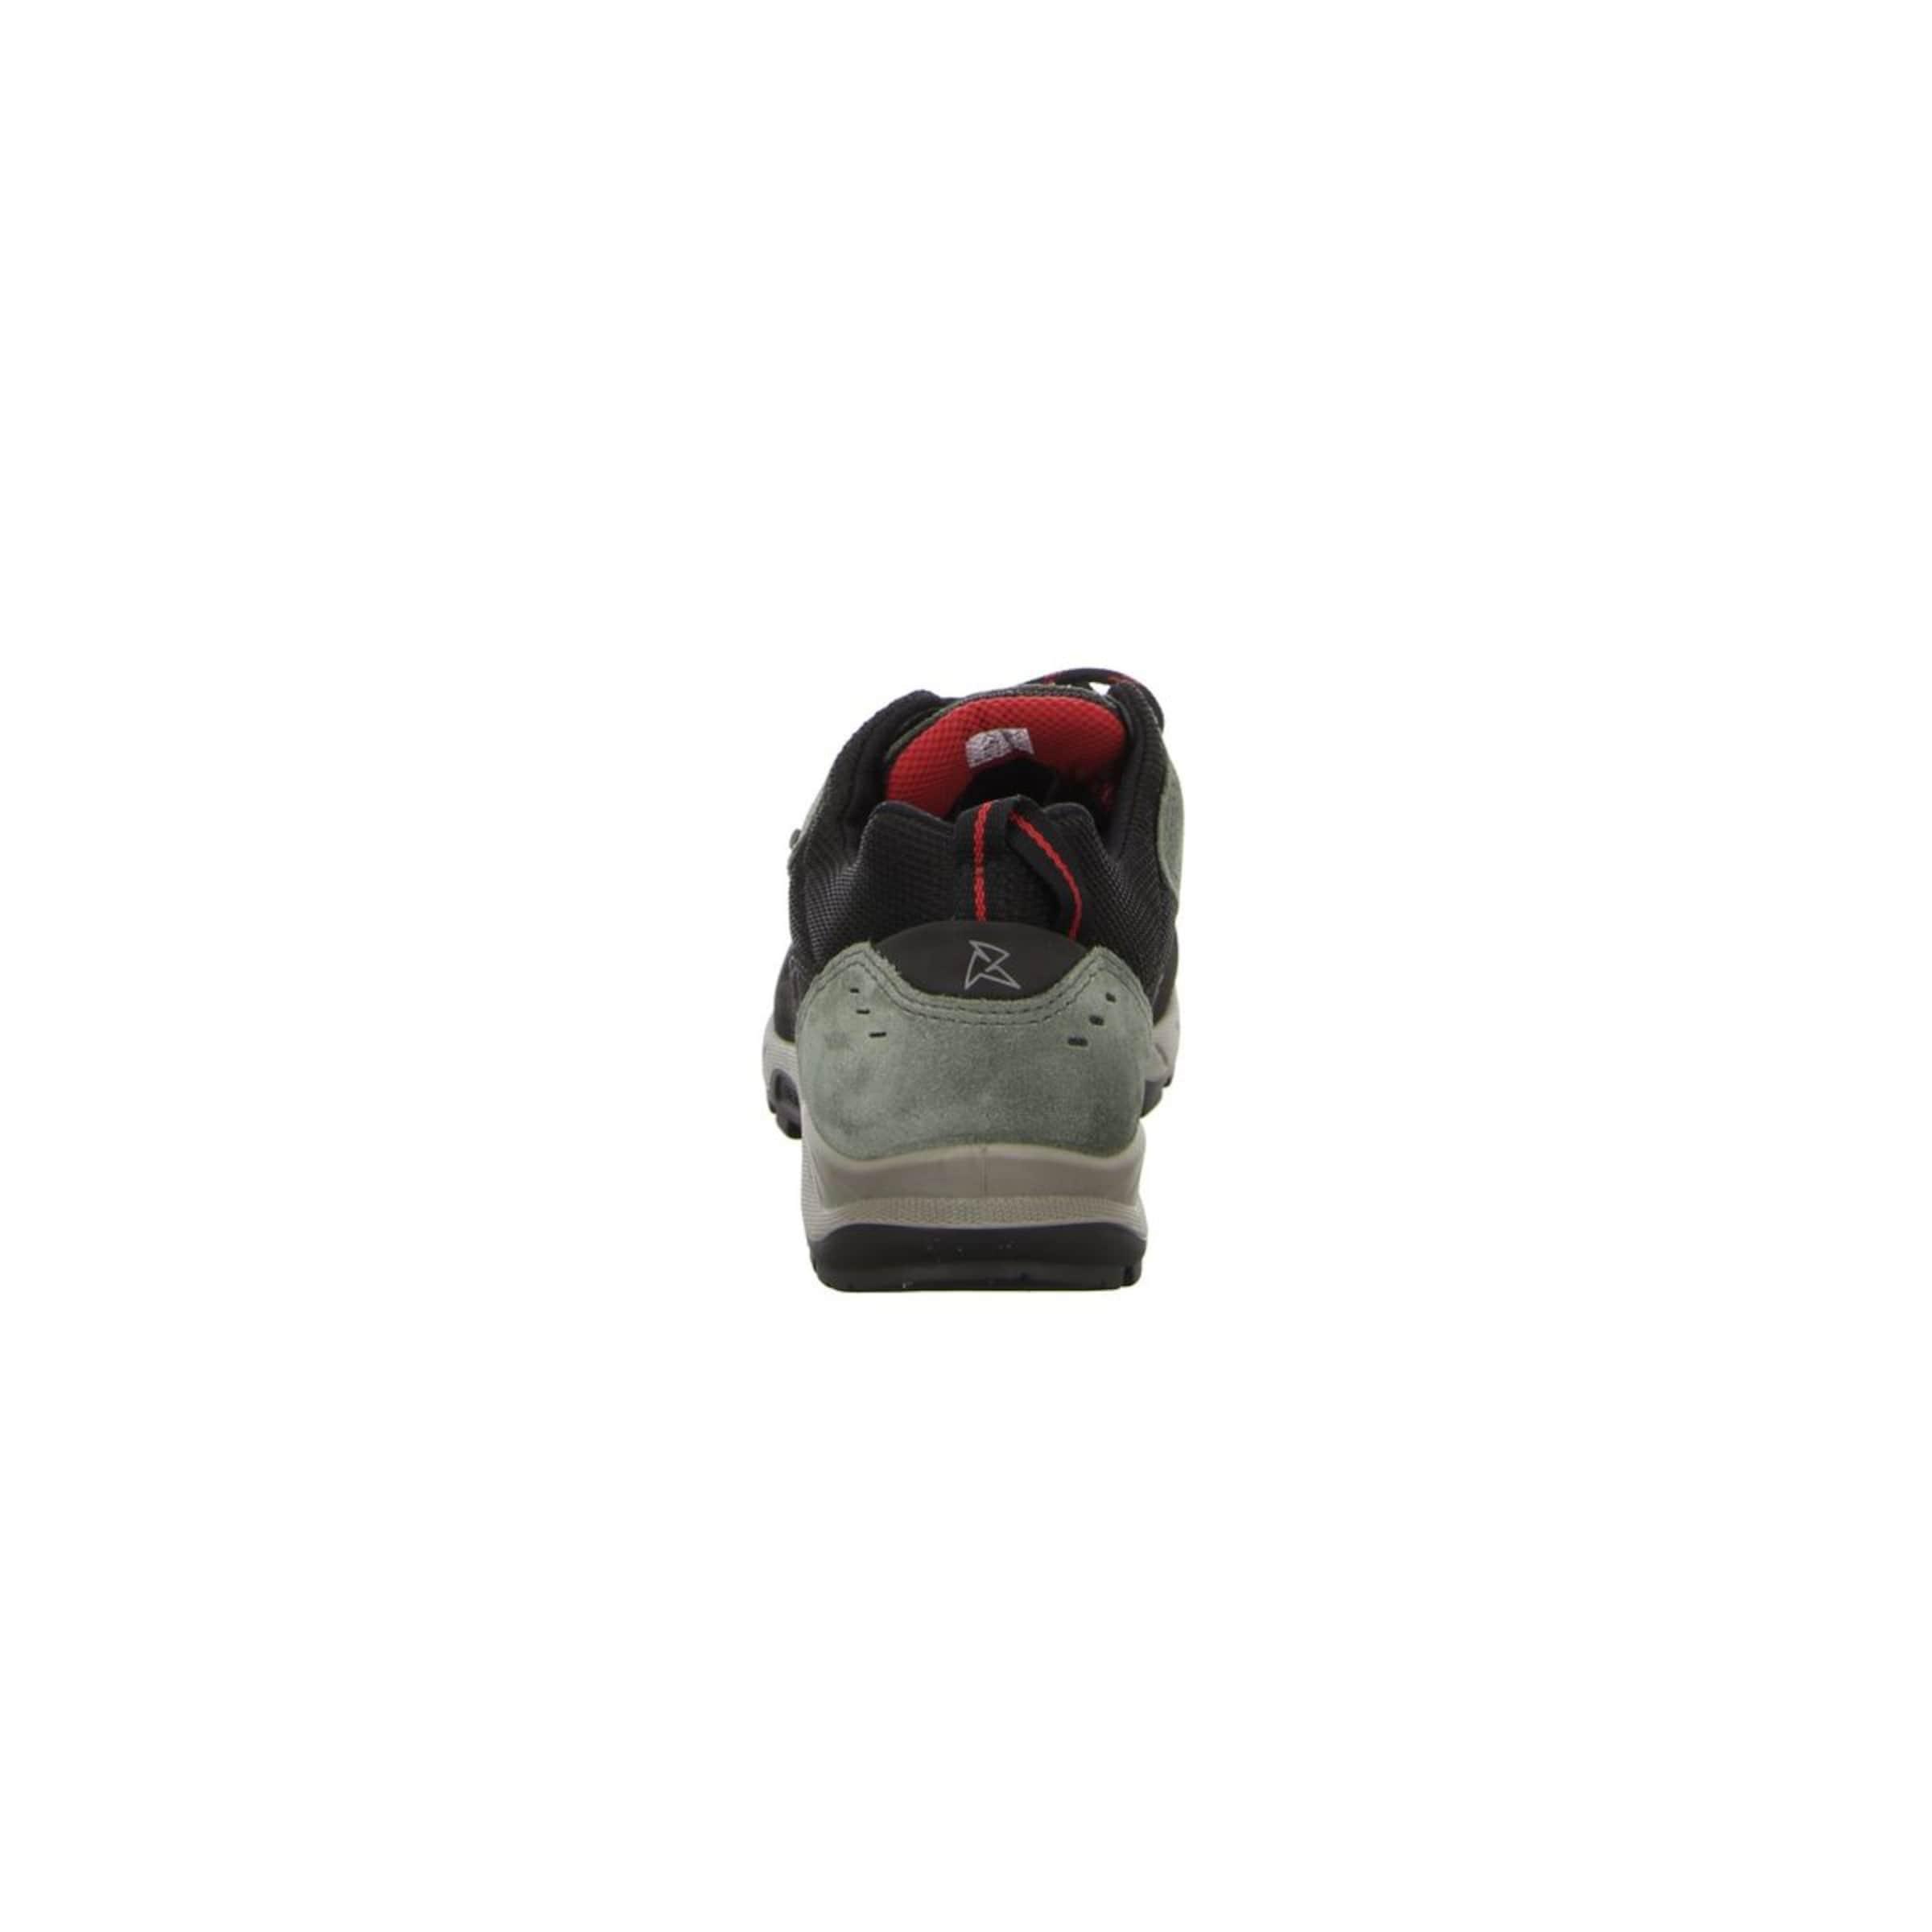 ECCO Schnürschuhe Schnürschuhe Schnürschuhe 100 % Leder Großer Rabatt c5d07f